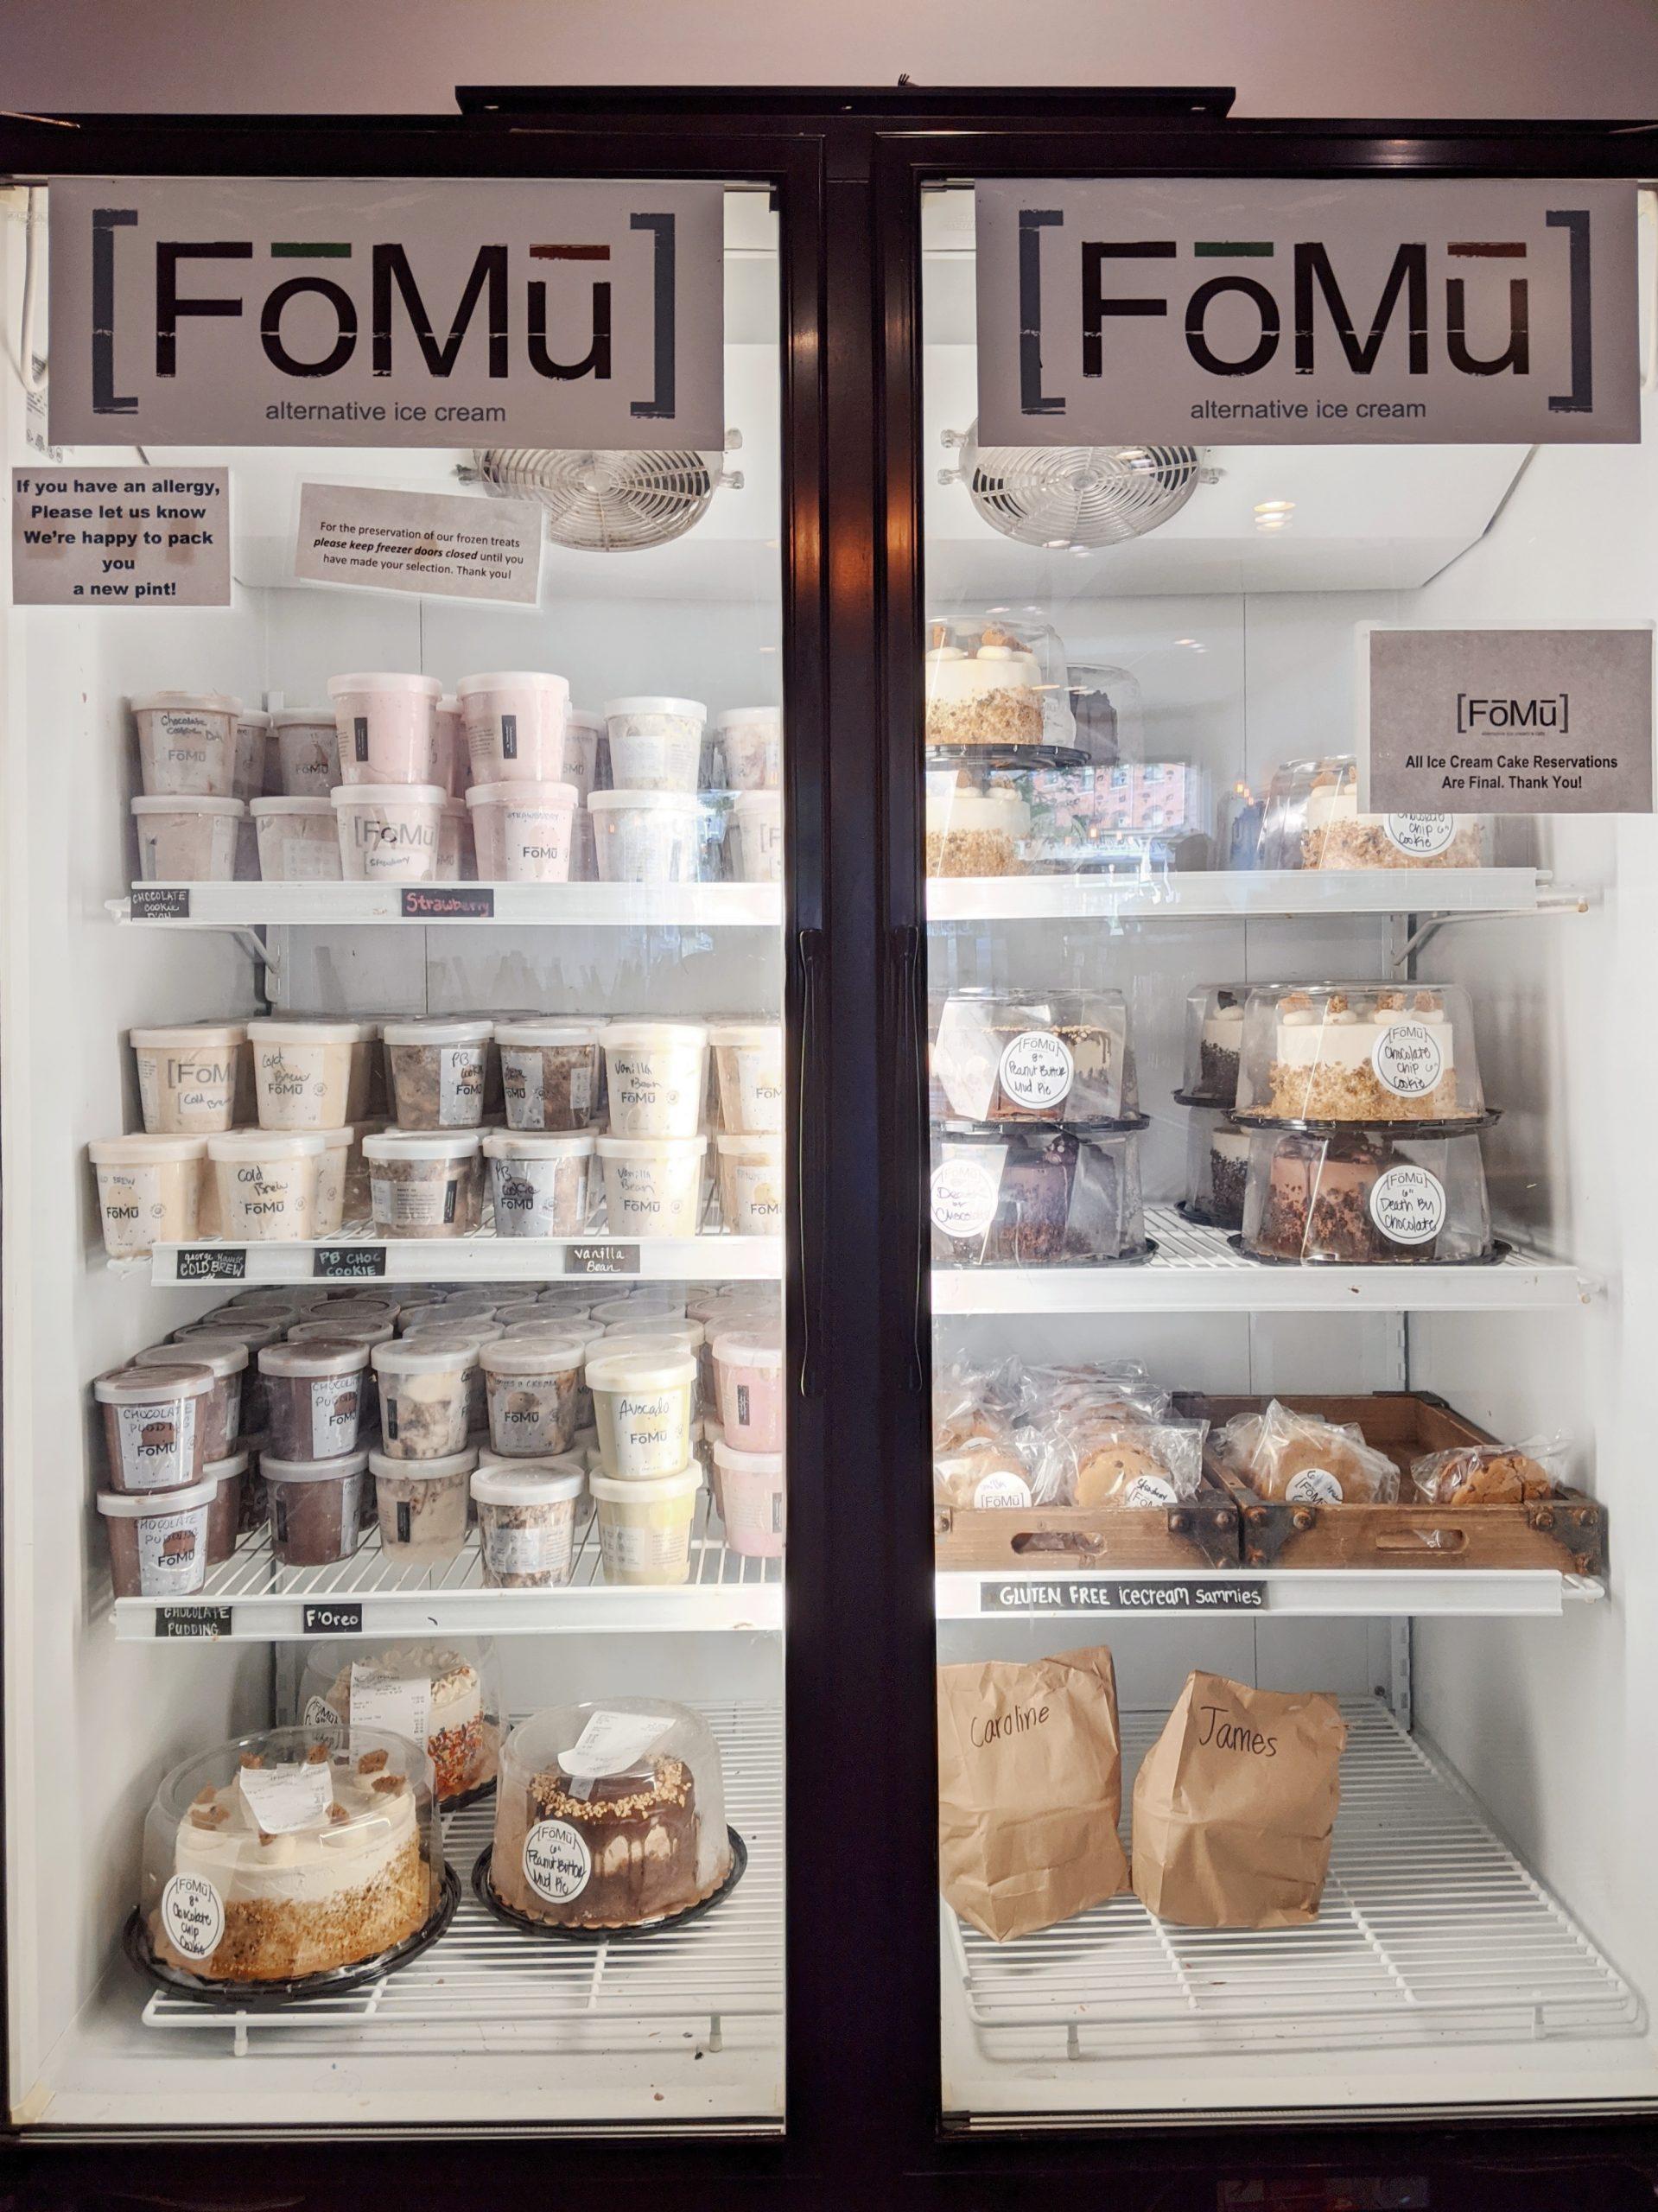 FoMu vegan ice cream - freezer full of ice cream pints and cakes